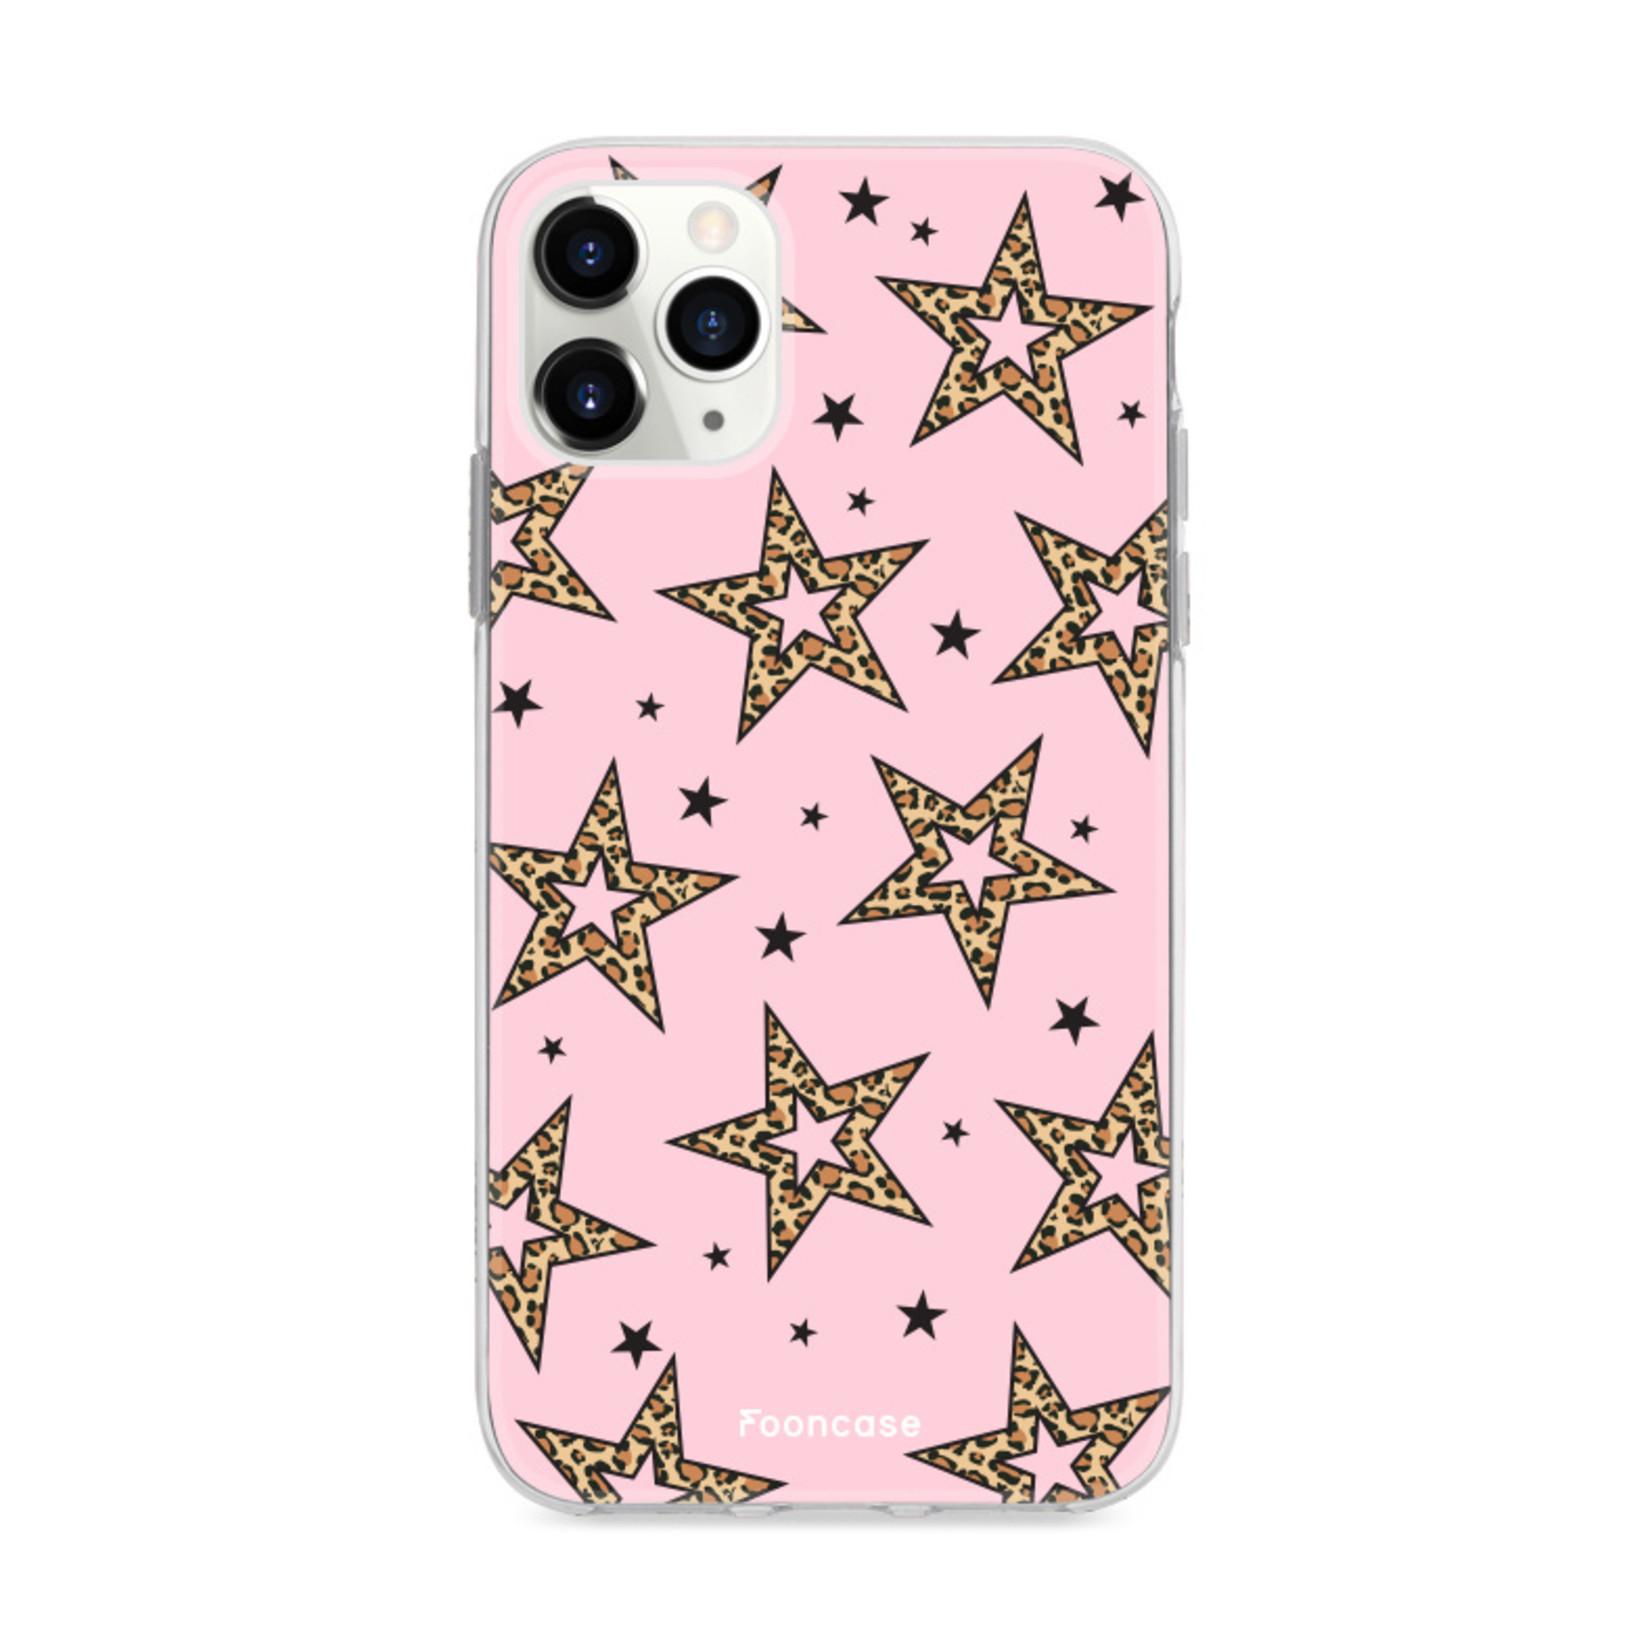 IPhone 11 Pro Handyhülle - Rebell Stars